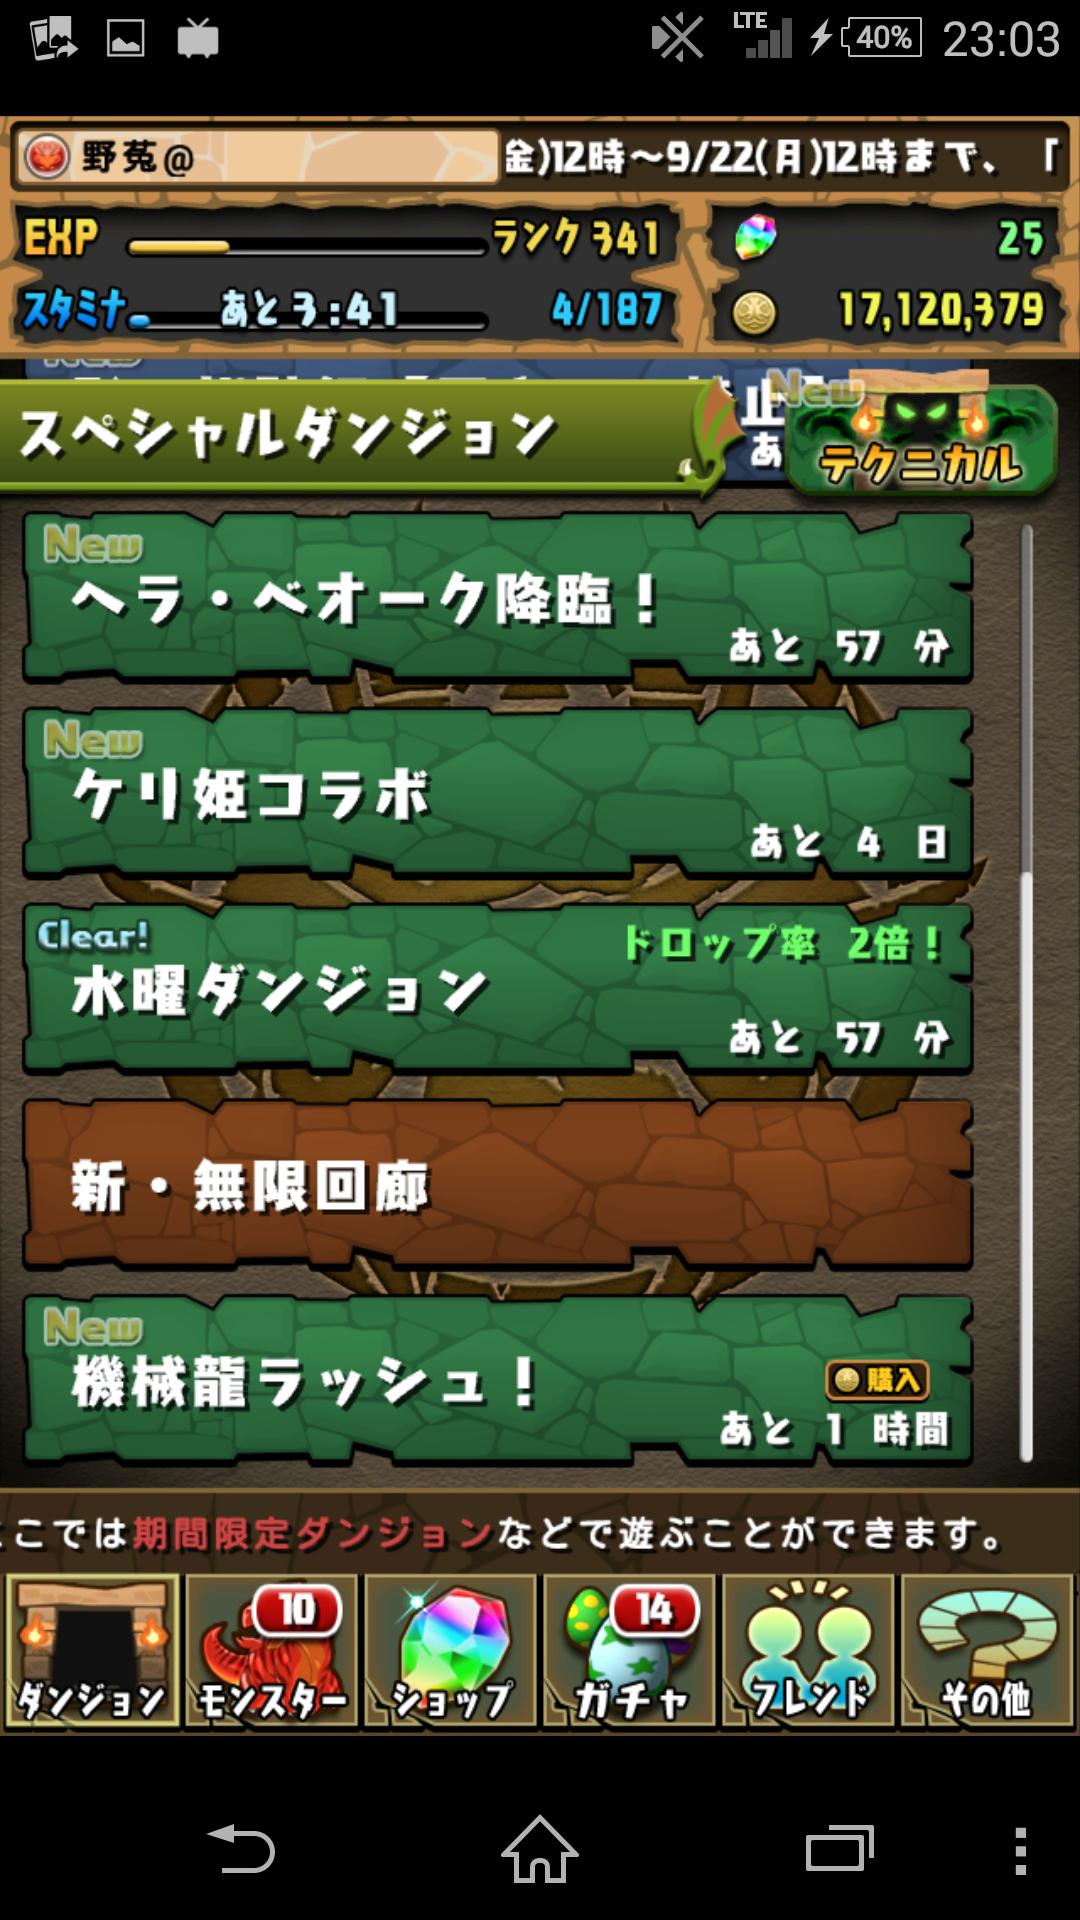 Screenshot_2014-09-17-23-03-04.png